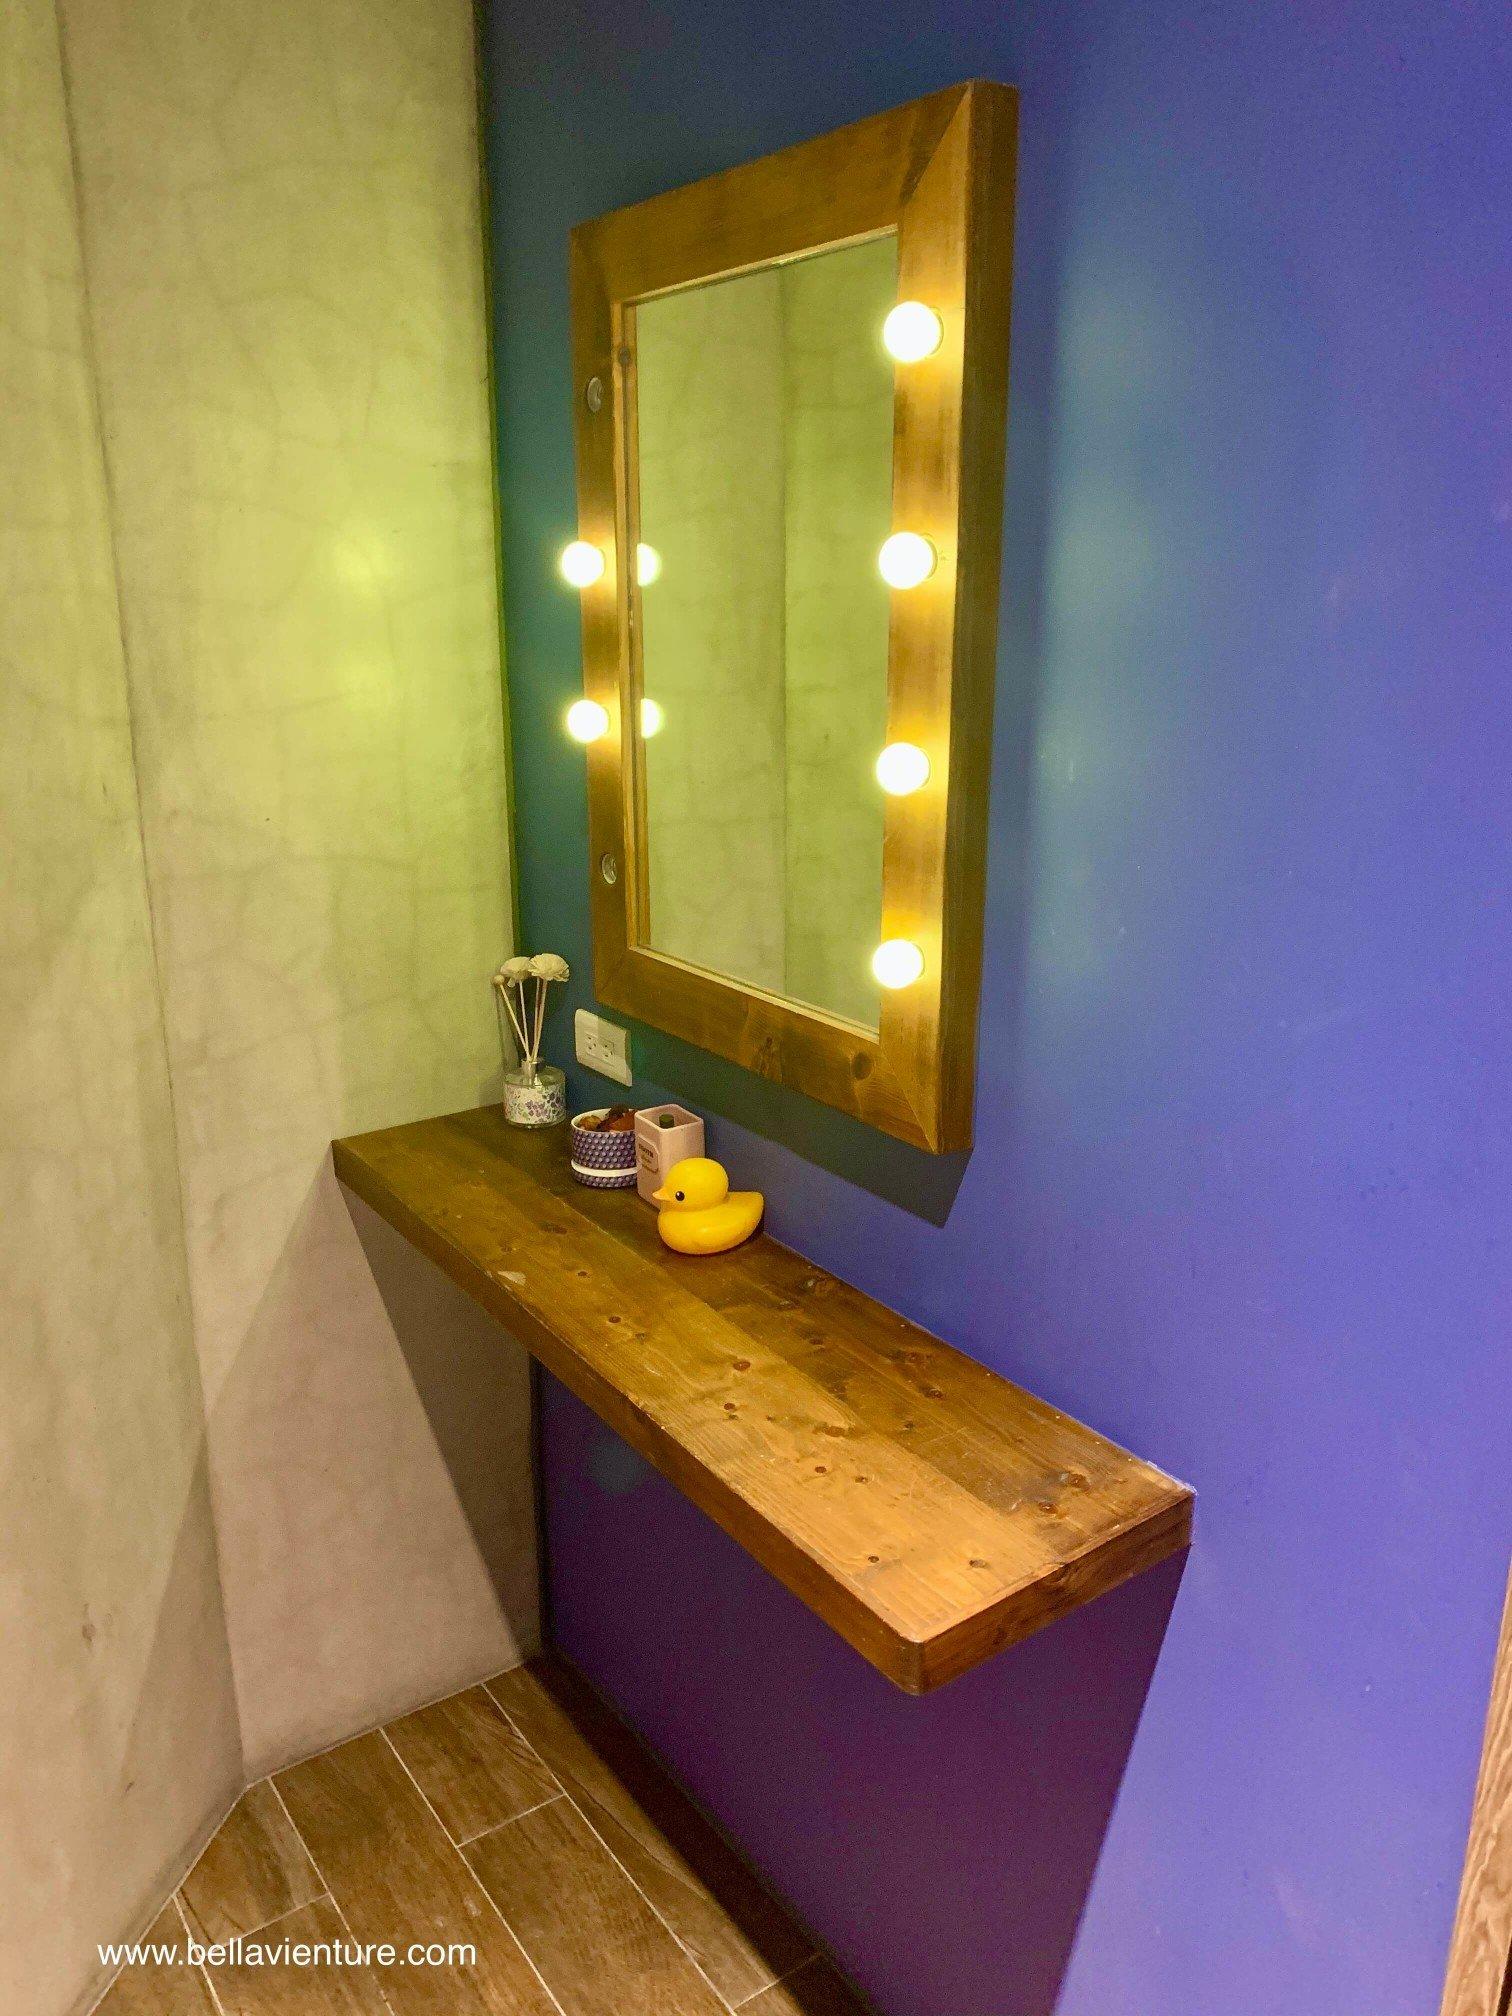 台北 信義區 She_Design TAPAS SOJU BAR 廁所